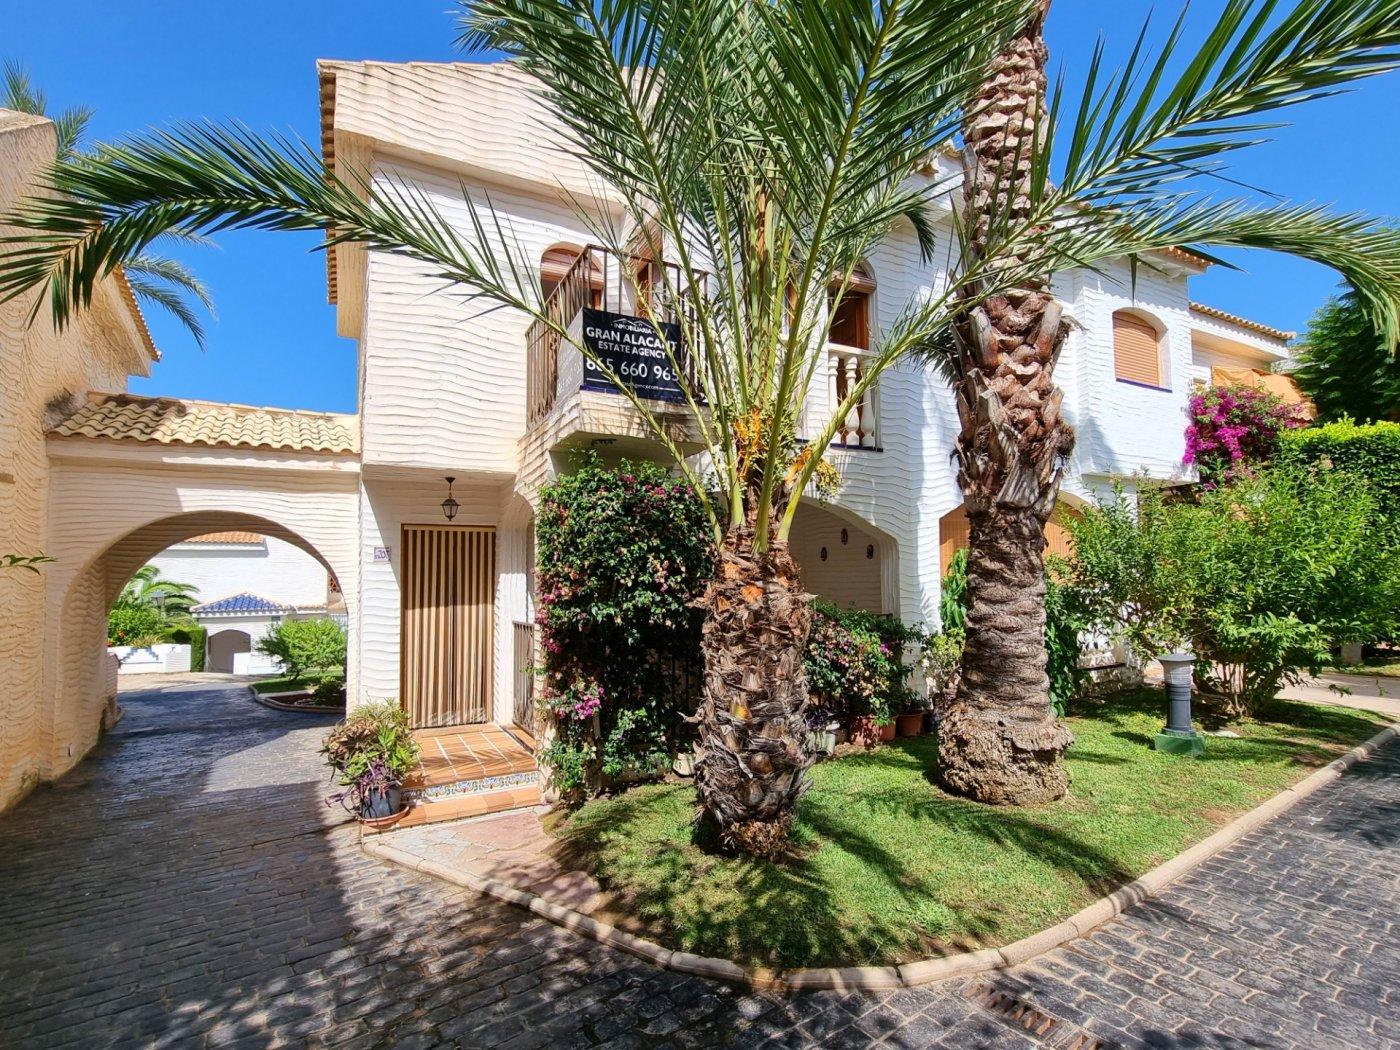 bungalow en gran-alacant · costa-hispania 119990€